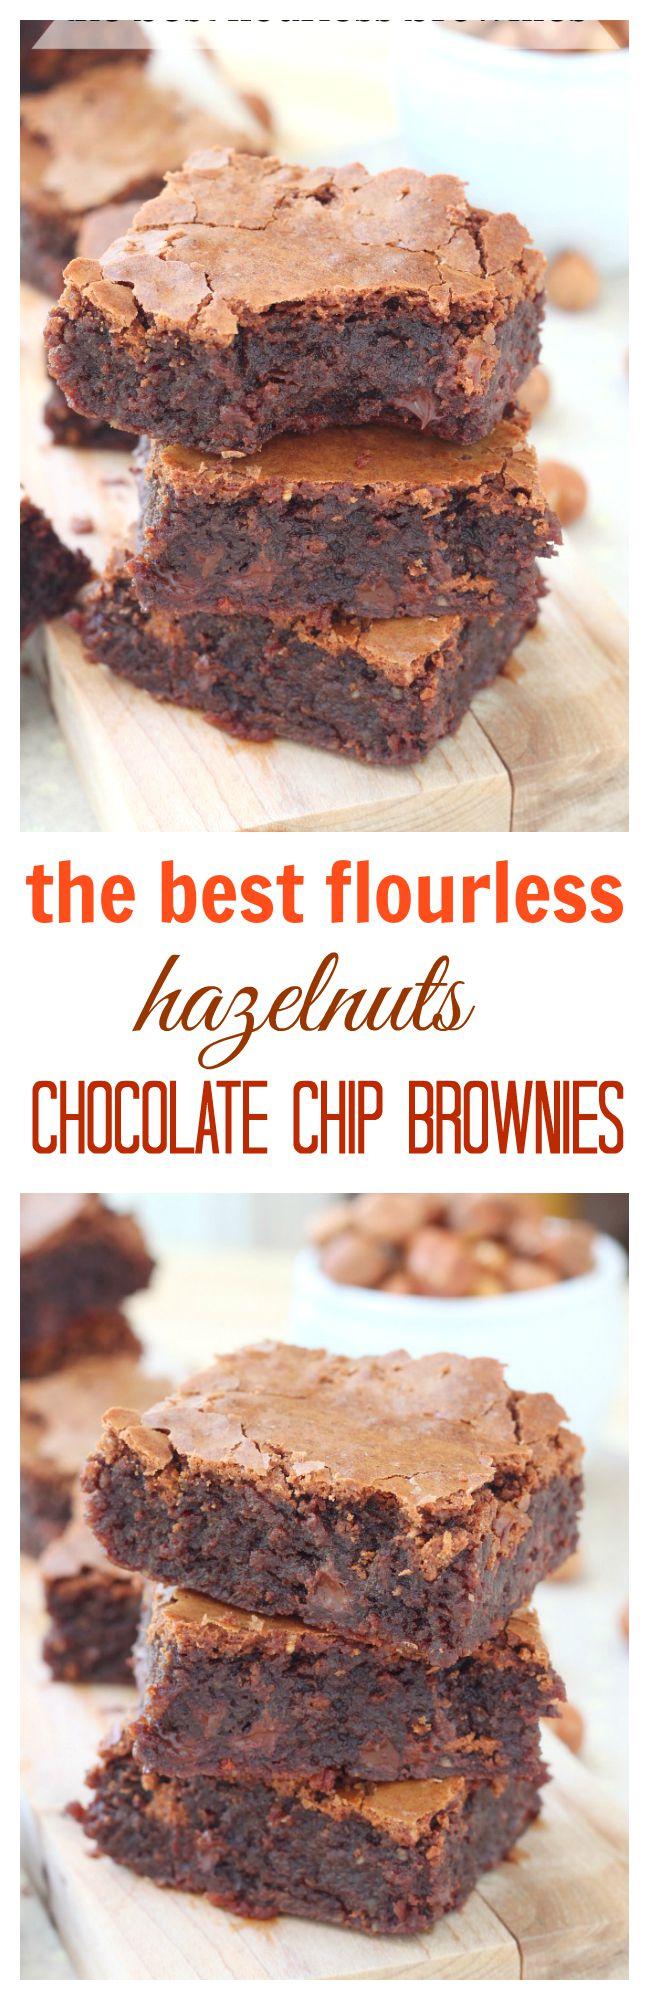 The best flourless hazelnut chocolate chip brownies recipe